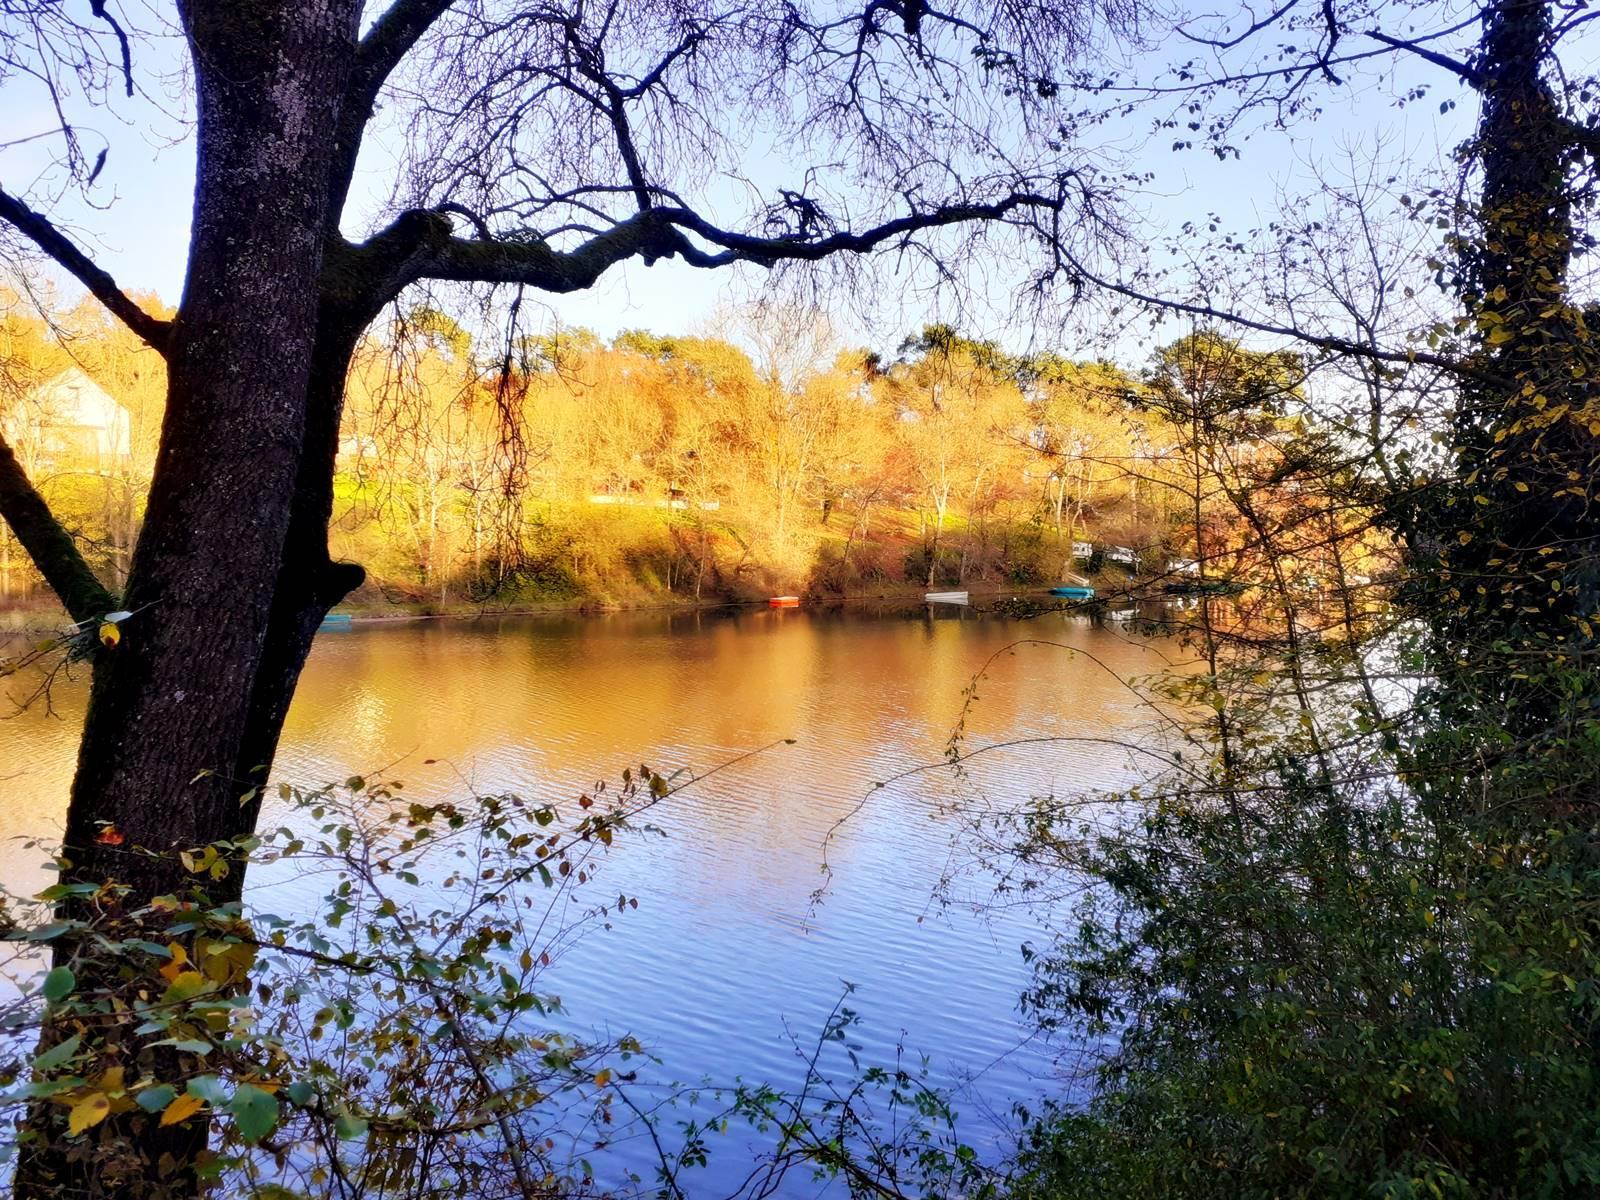 Moisdon la riviere faible20201128 172656